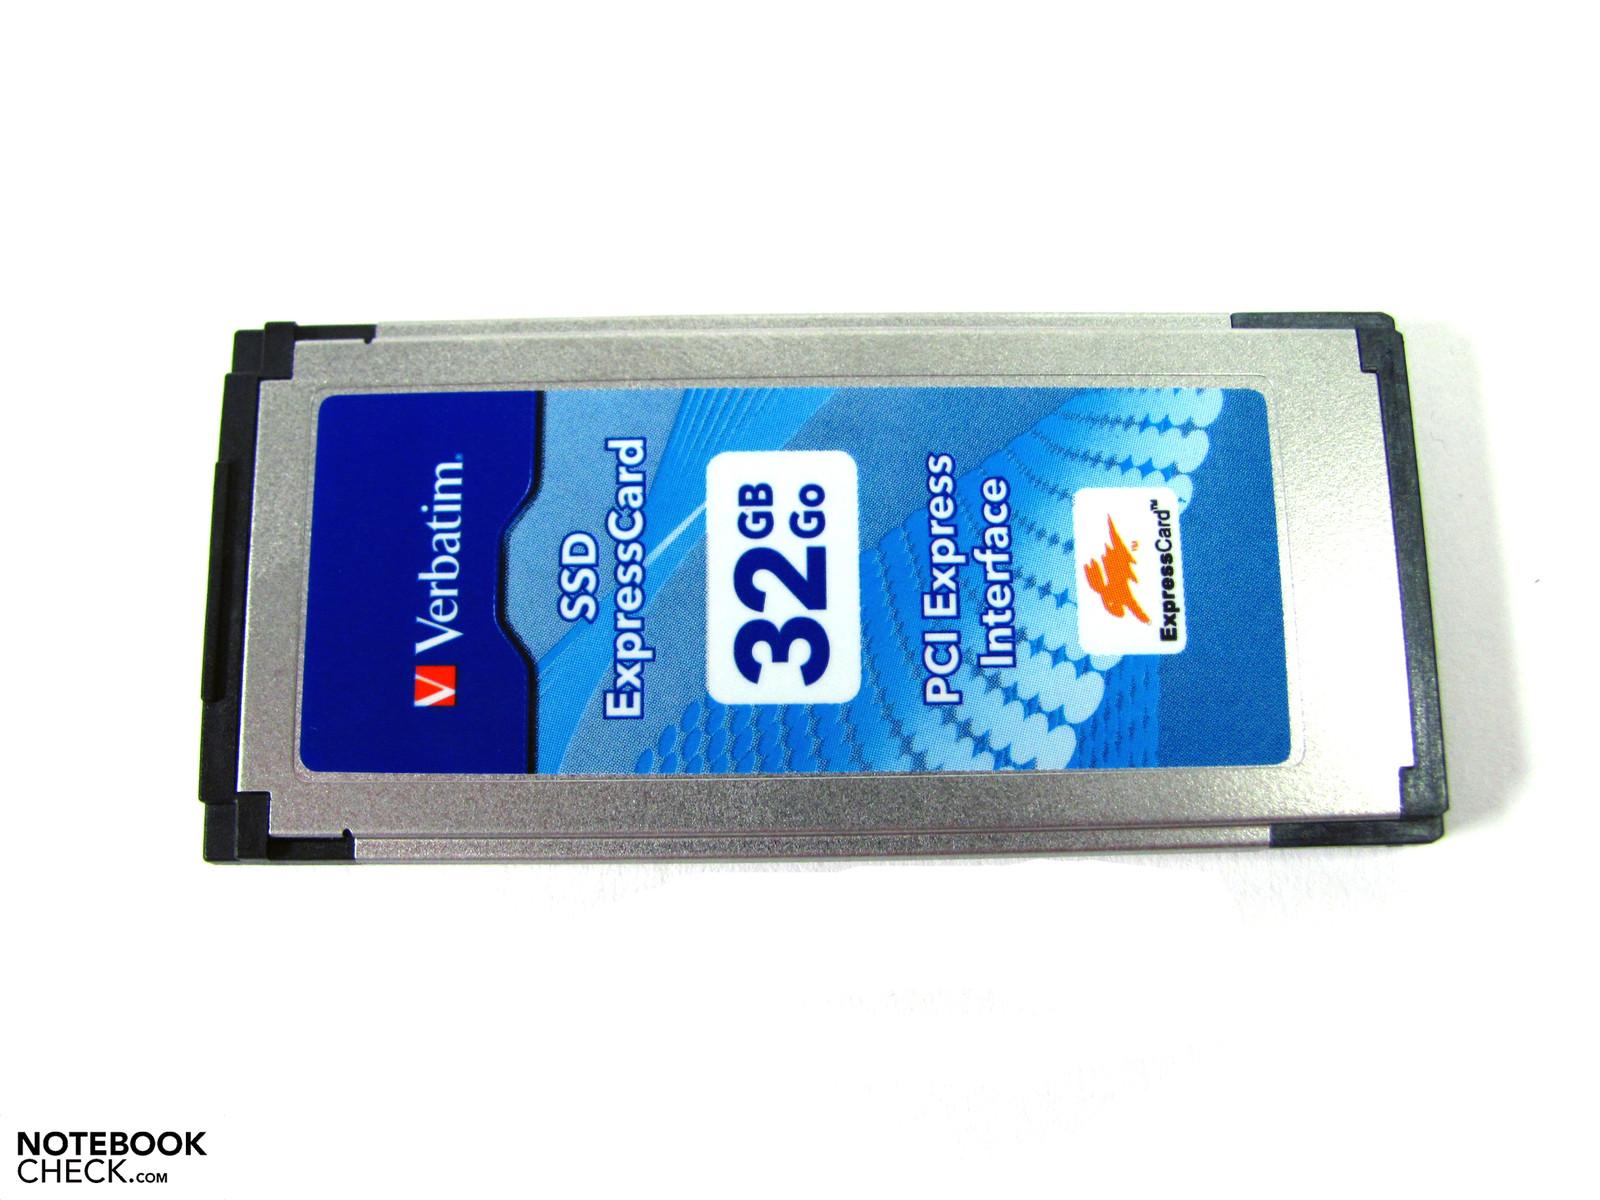 Review Verbatim Ssd Expresscard 32 Gb Notebookcheck Net